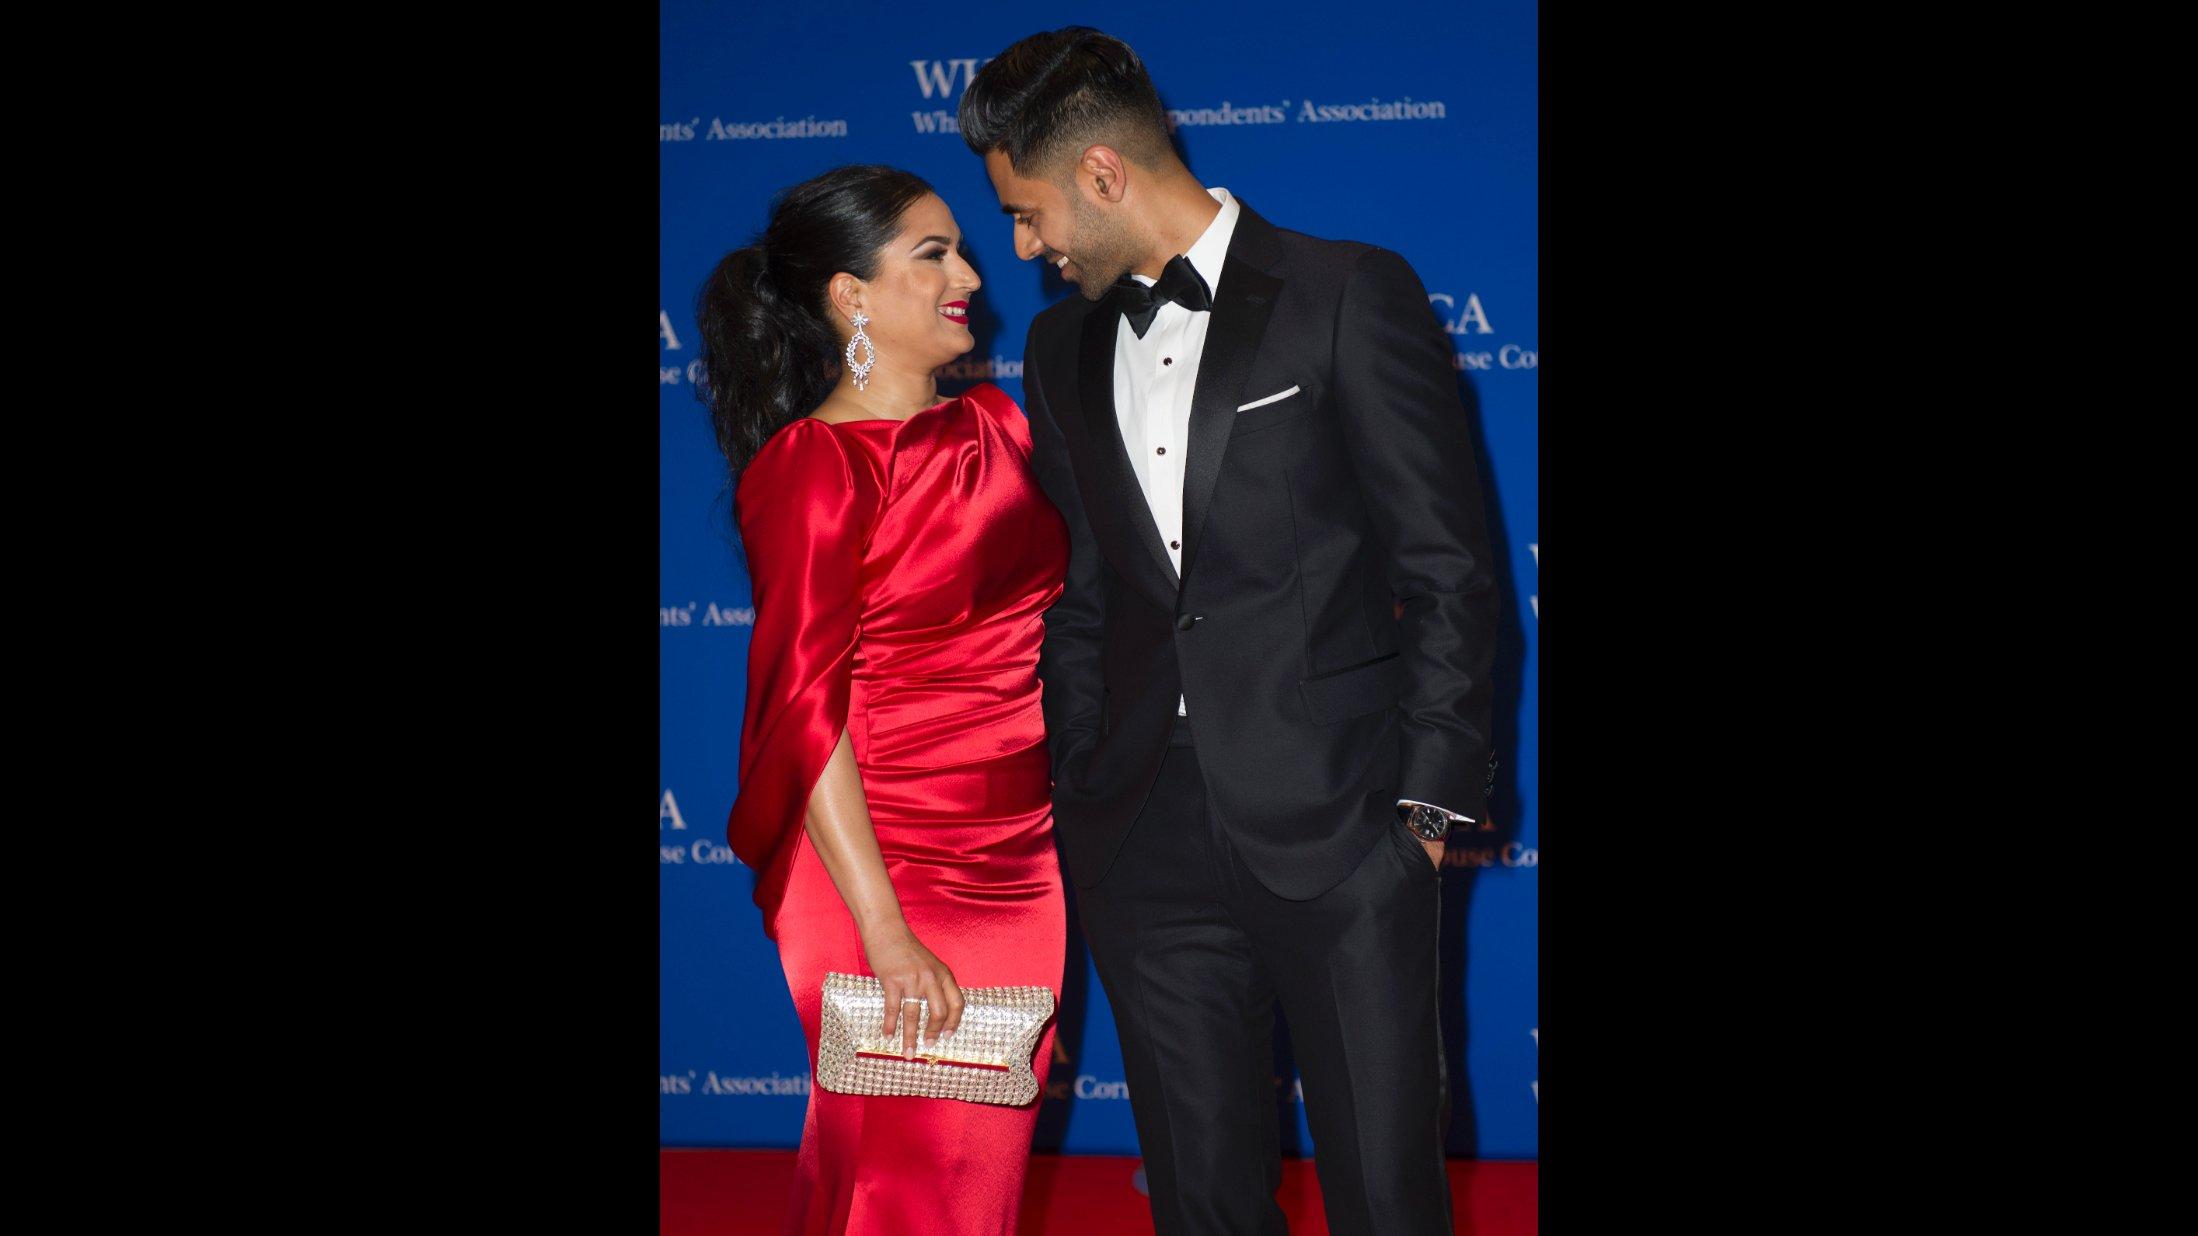 Weddings & Events Robe De Soiree Muslim Evening Dress 2019 Mermaid High Collar Illusion Long Sleeves Lace Dubai Saudi Arabic Long Evening Gown Pleasant In After-Taste